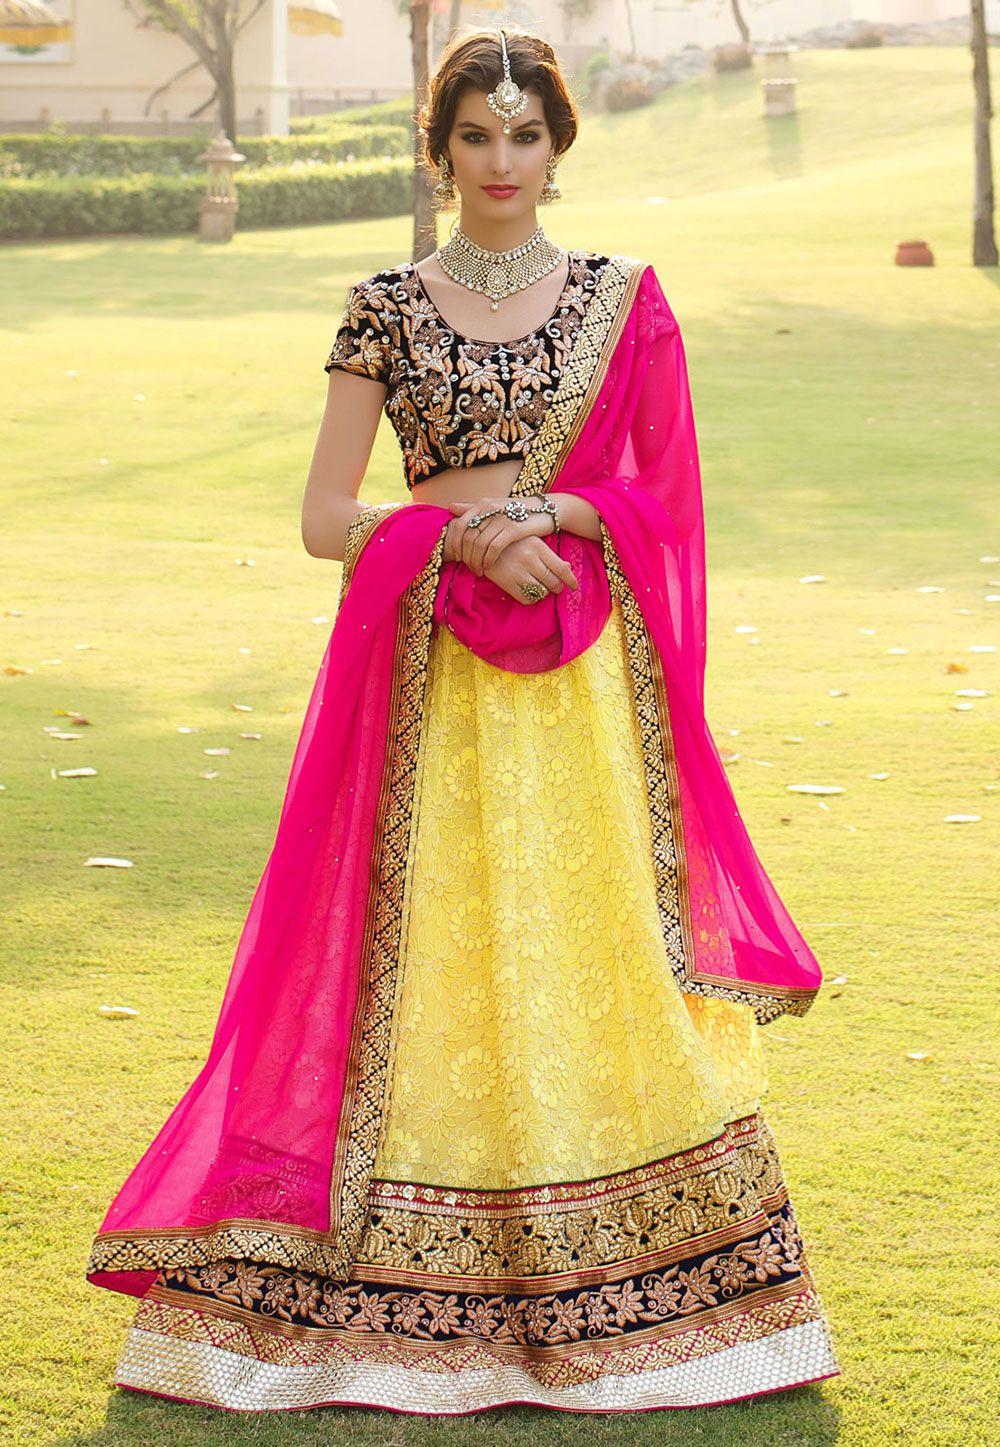 fdffd880ee Buy imitation jewellery online from designers across India. #Yellow Faux  Georgette #LehengaCholi with Dupatta